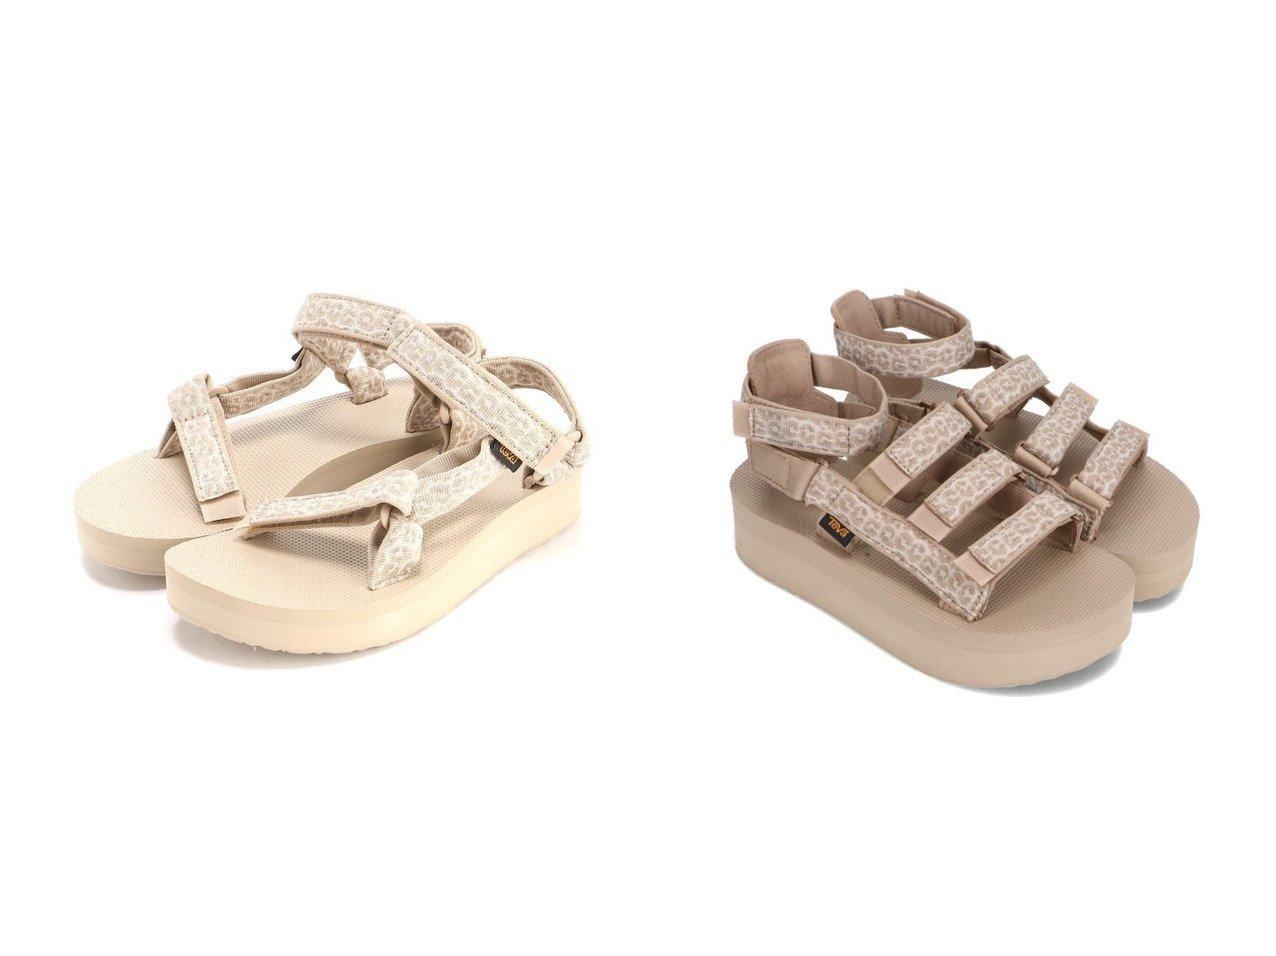 【TEVA/テバ】のMIDFORM U&TEVA FLATFORM MEVIA 【シューズ・靴】おすすめ!人気、トレンド・レディースファッションの通販 おすすめで人気の流行・トレンド、ファッションの通販商品 メンズファッション・キッズファッション・インテリア・家具・レディースファッション・服の通販 founy(ファニー) https://founy.com/ ファッション Fashion レディースファッション WOMEN 厚底 軽量 サンダル シューズ スポーツ ソックス ビーチ フォーム フラット ミュール ラップ |ID:crp329100000036735